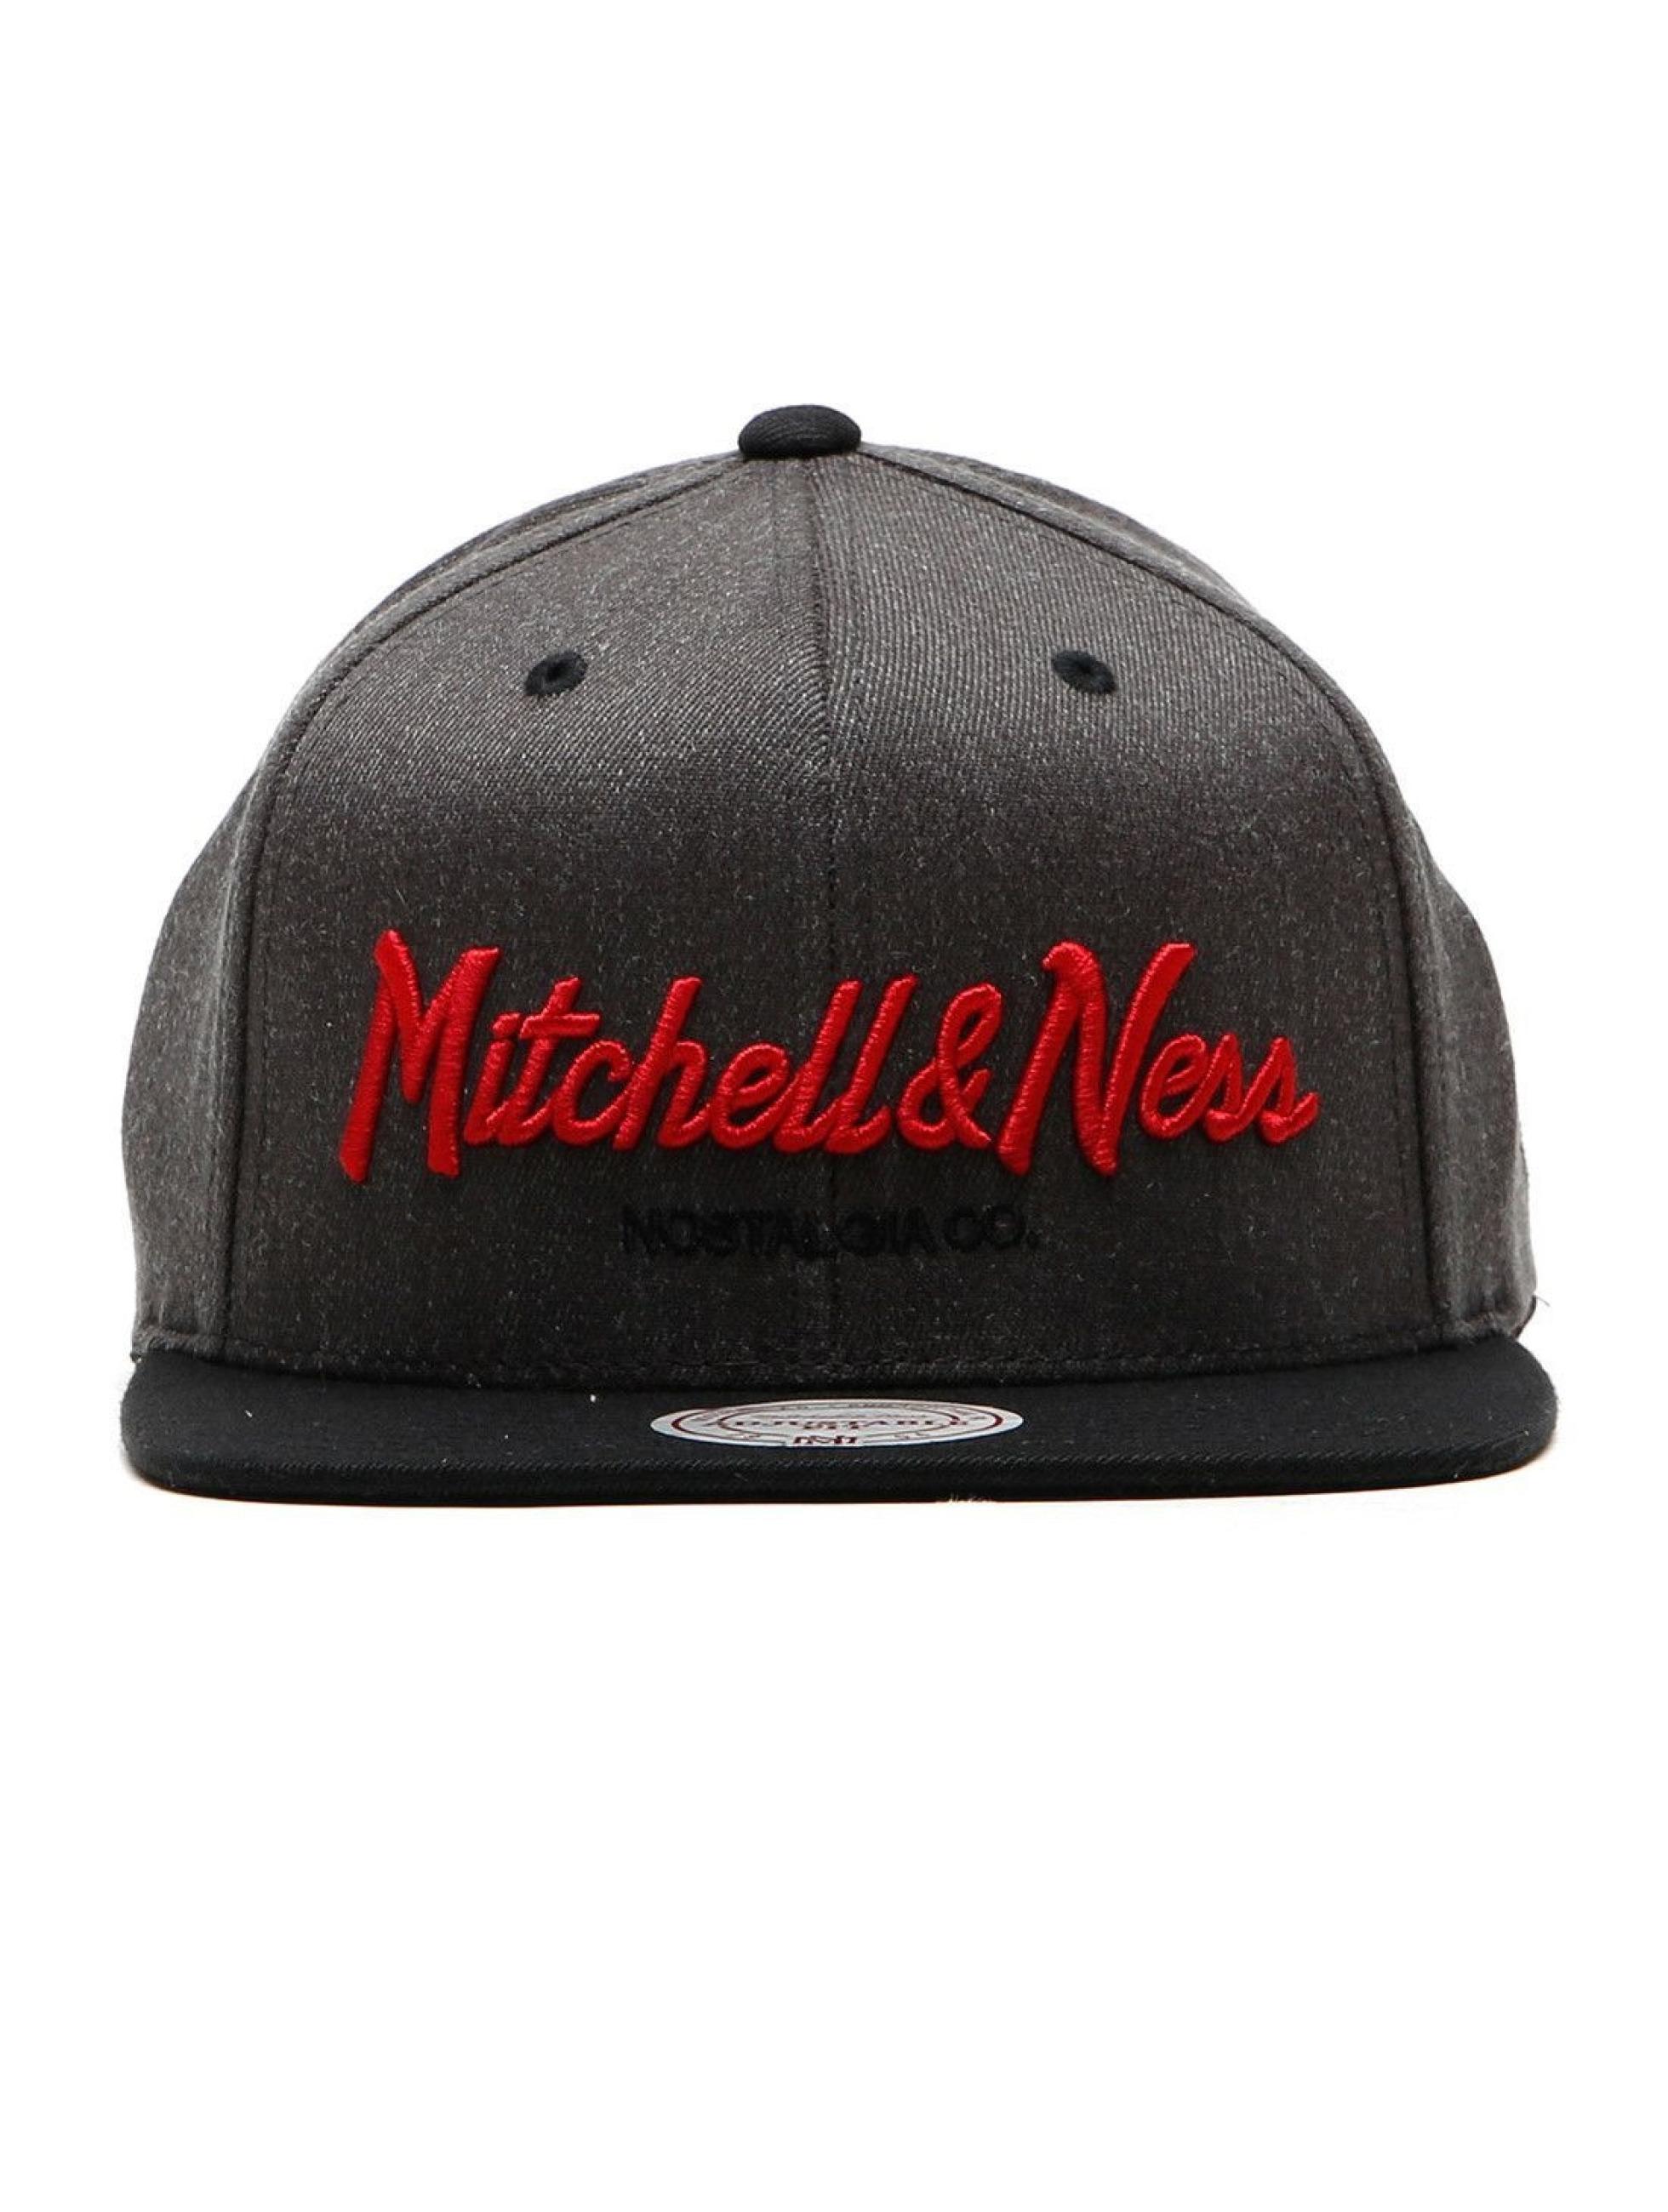 Mitchell & Ness Gorra Snapback 2-Tone gris